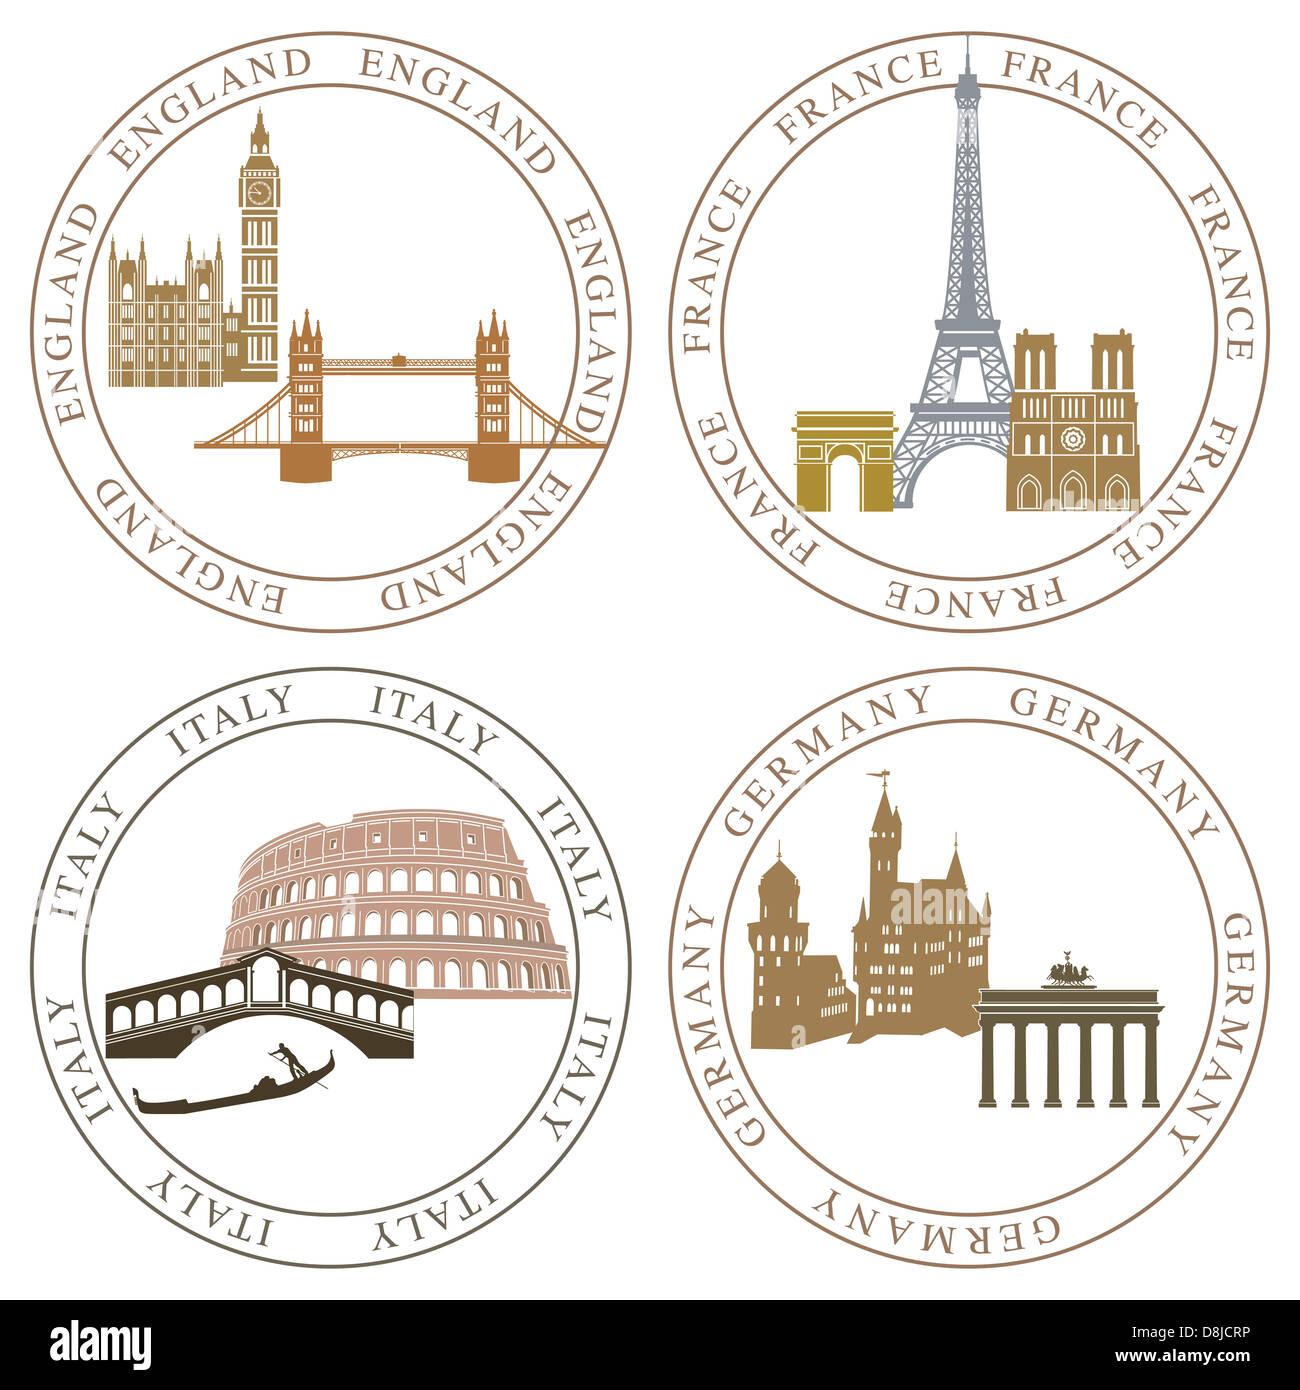 Europe landmarks and main cities - Stock Image